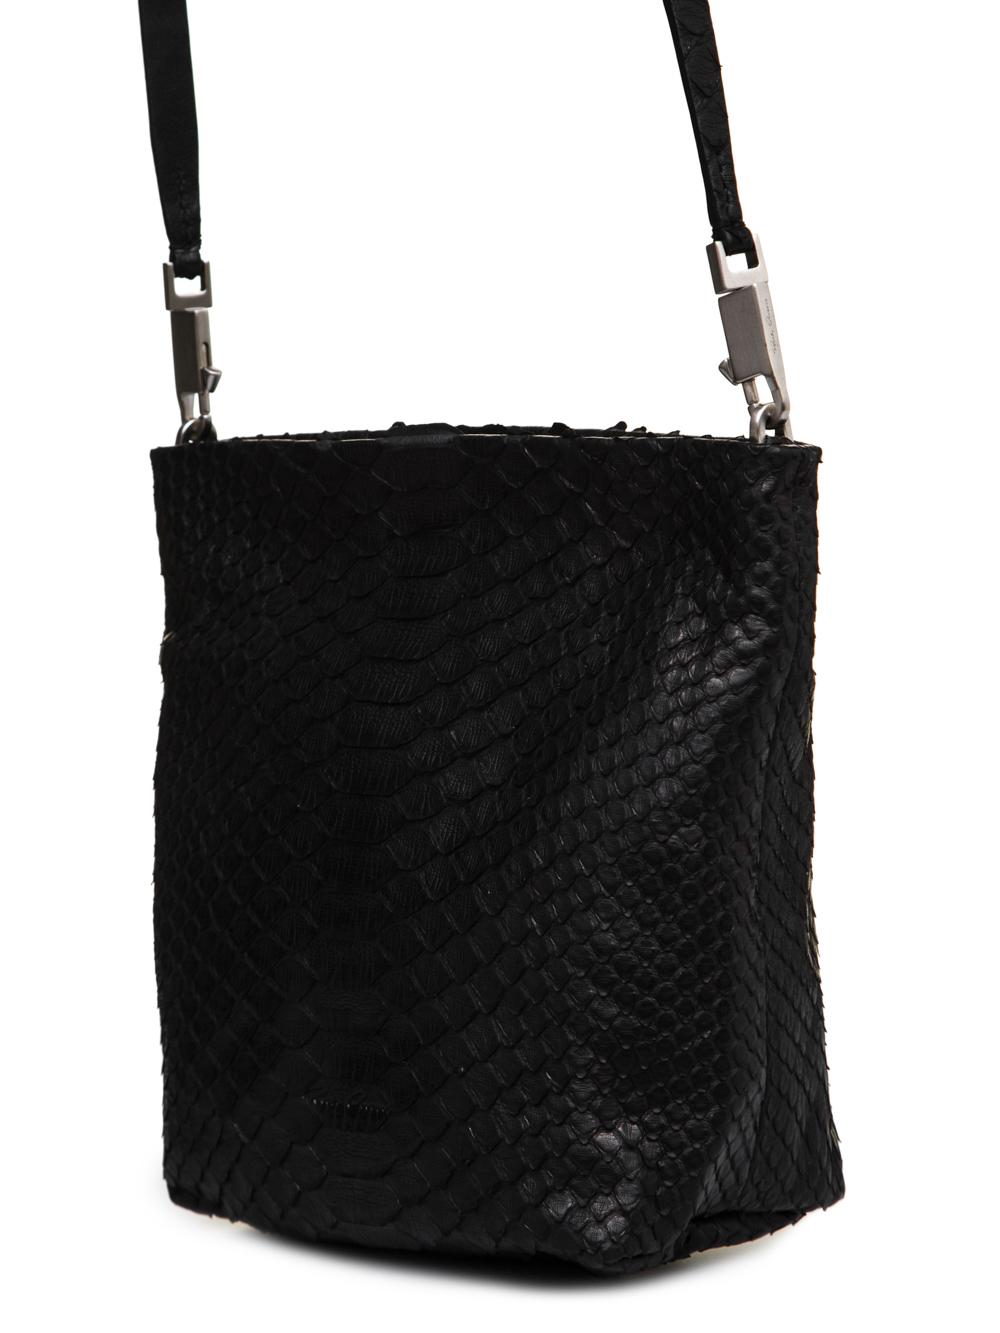 RICK OWENS FW18 SISYPHUS SMALL ADRI BAG IN BLACK PYTHON LEATHER